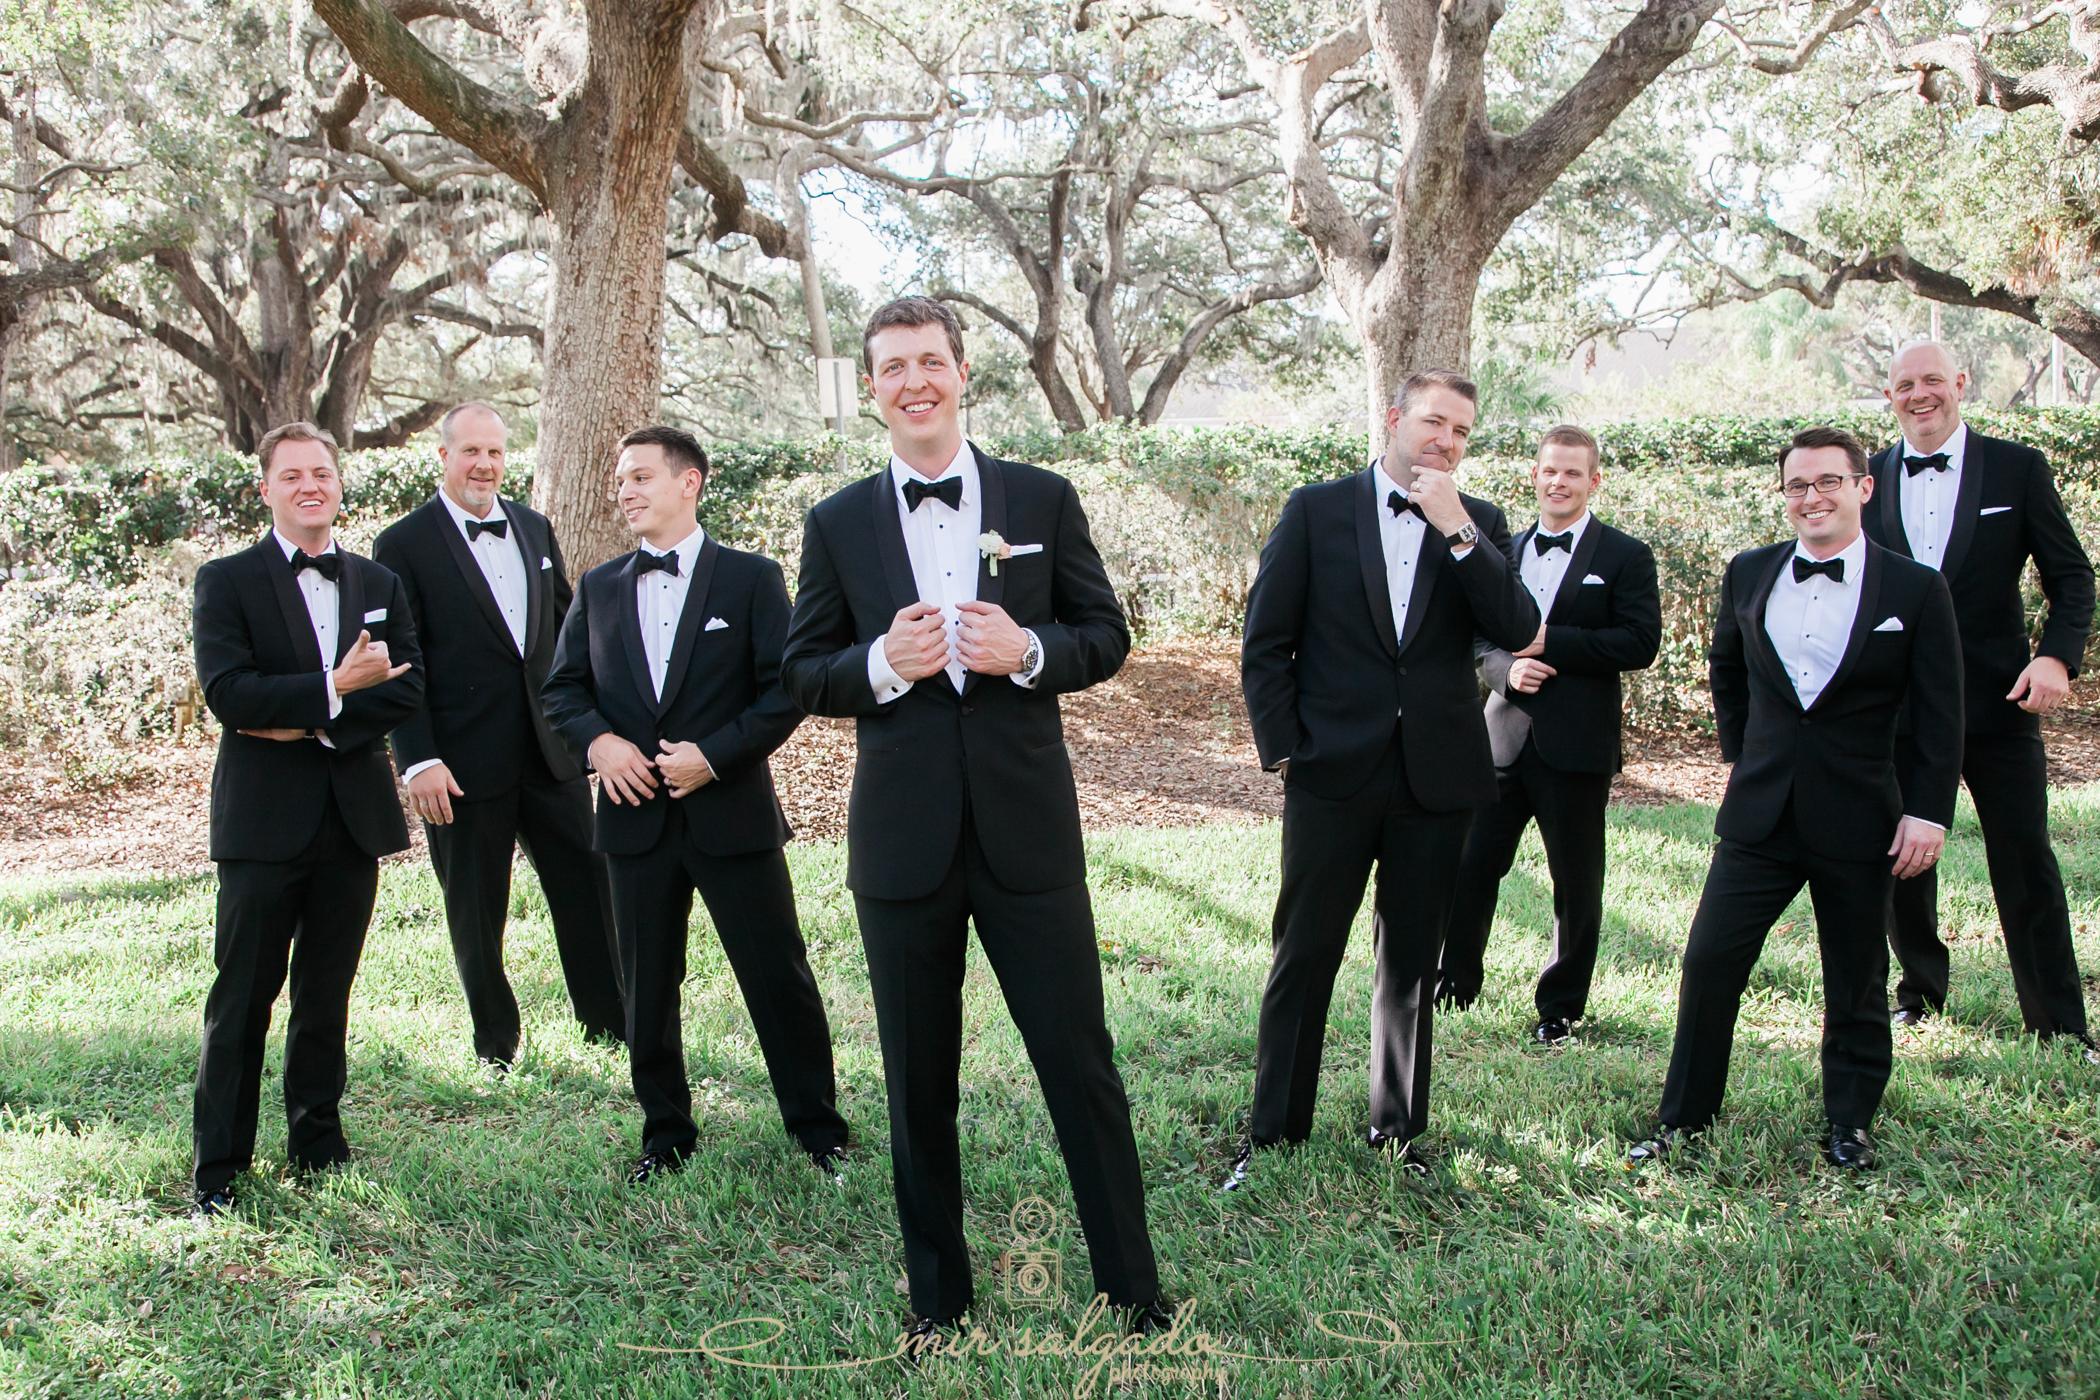 Tampa-wedding-photo, groomsmen-photo